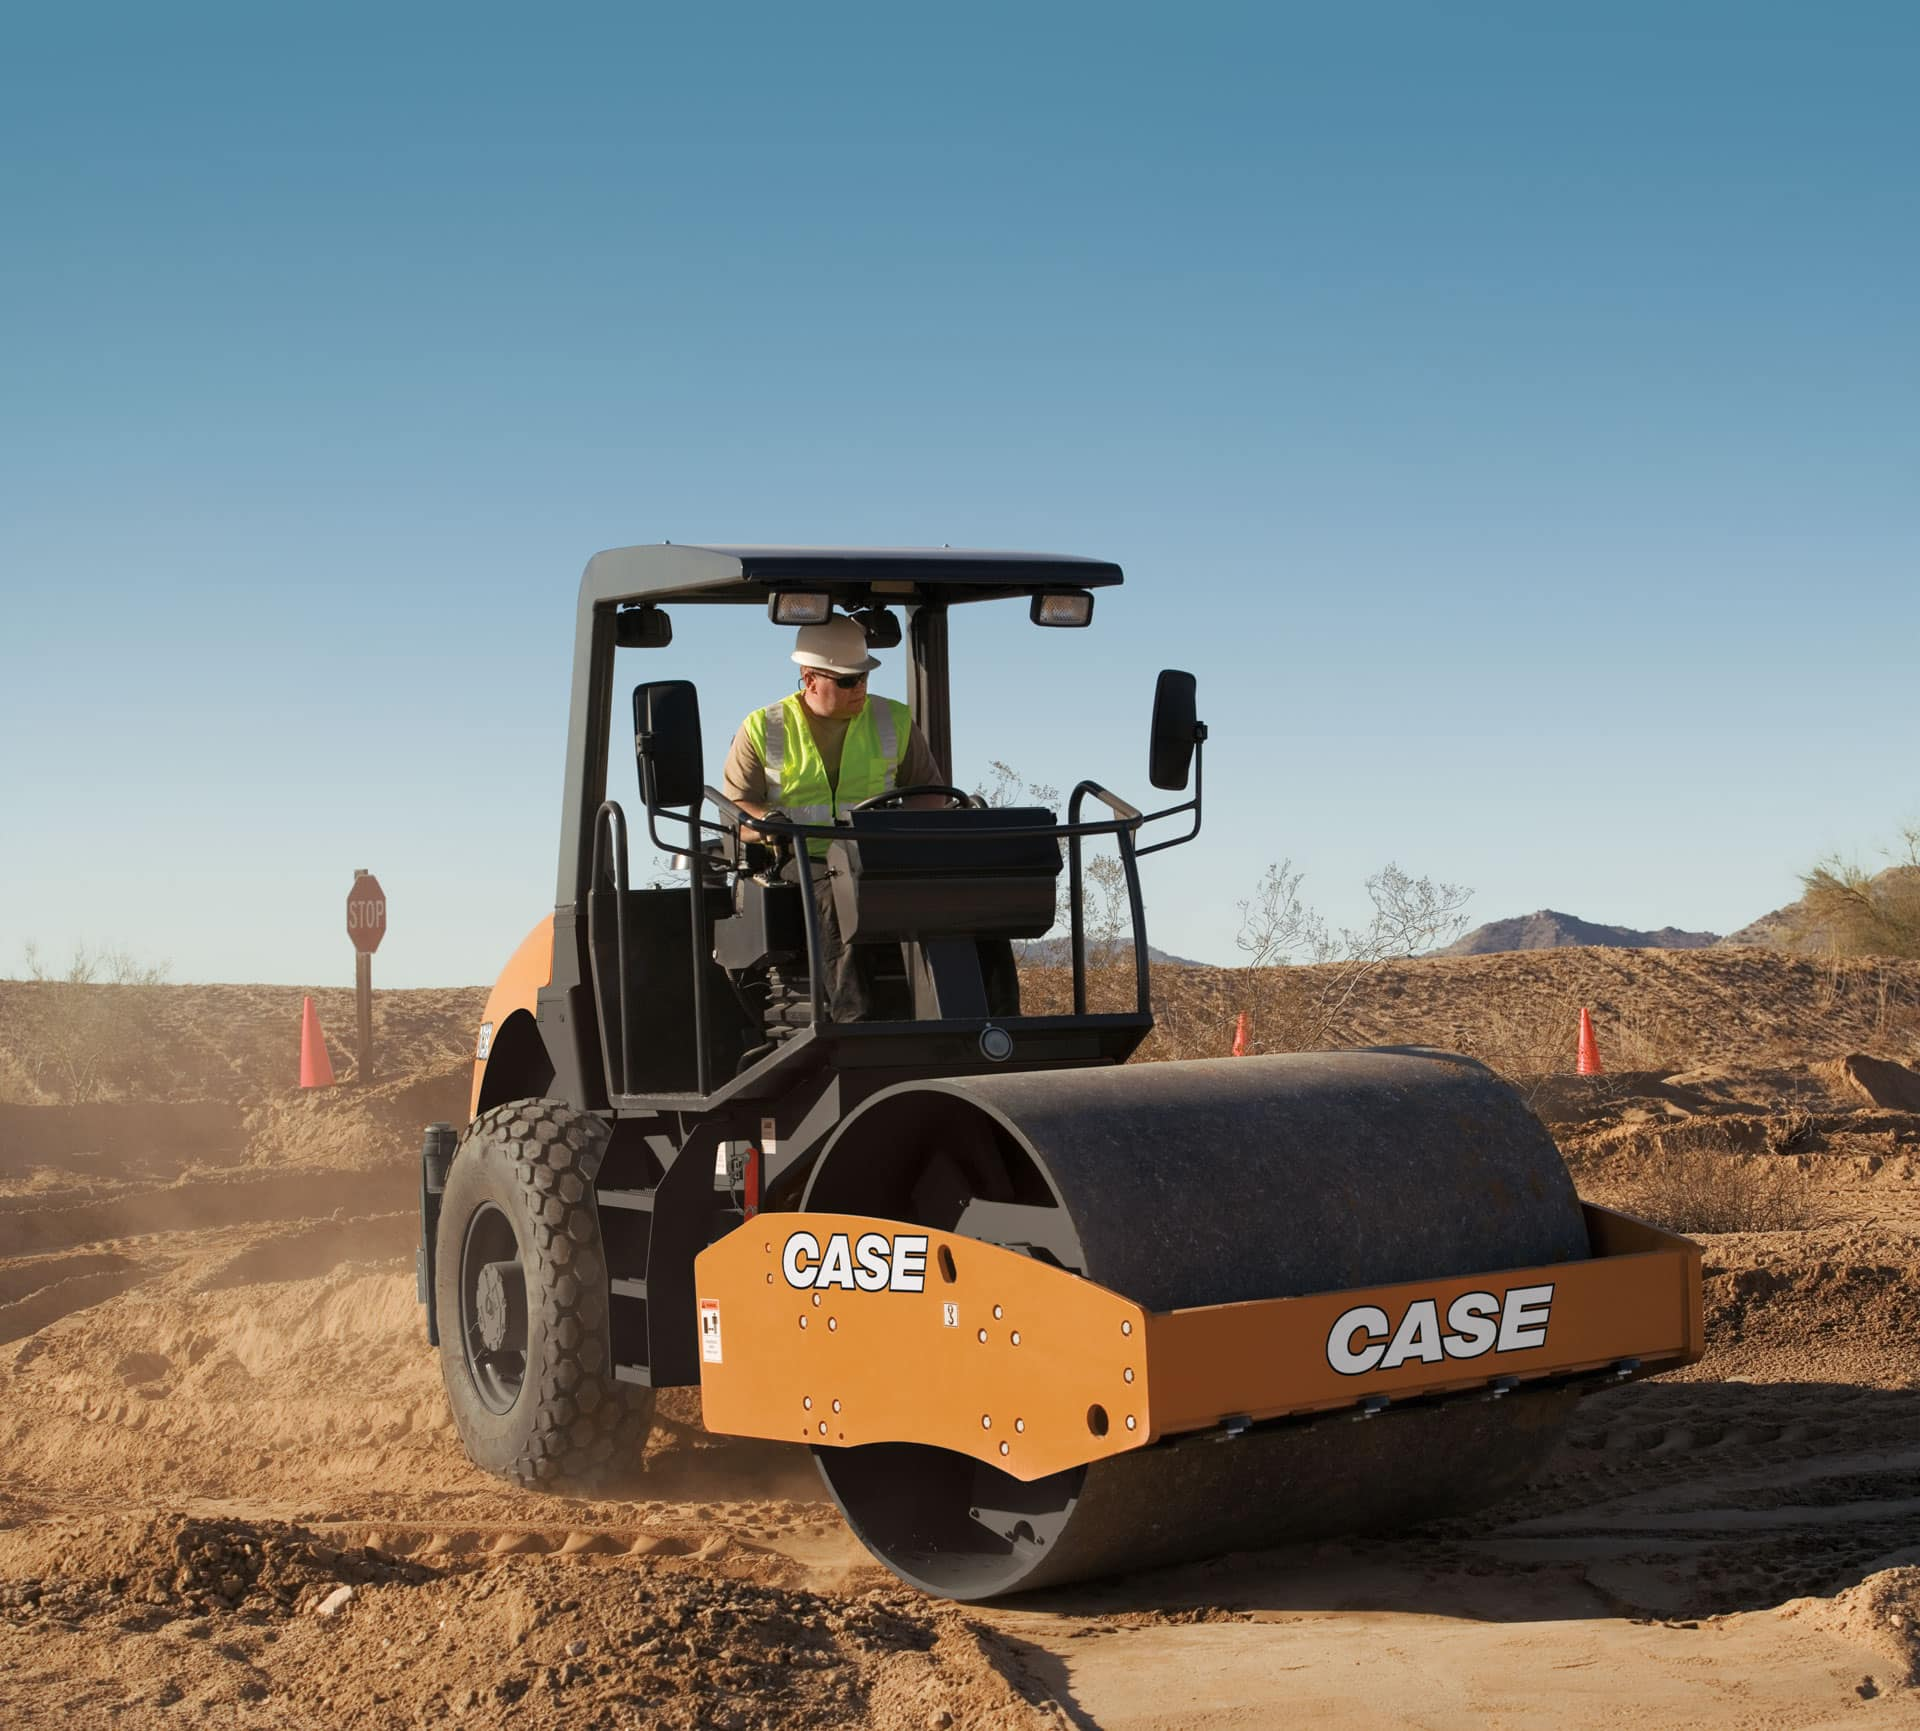 CASE SV208 Single Drum Roller | CASE Construction Equipment